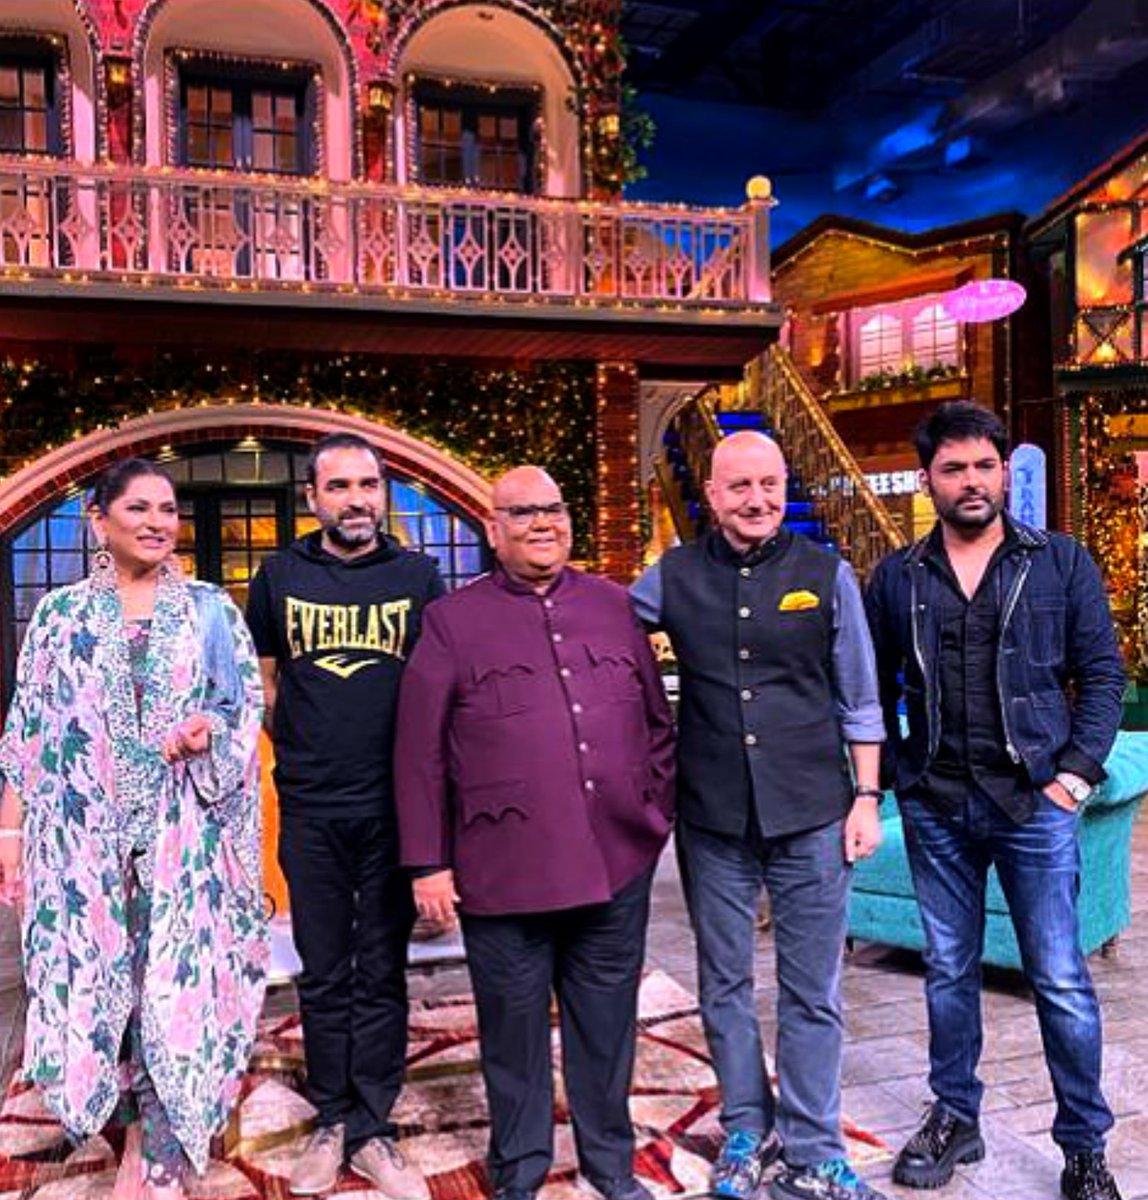 "Myself, Pankaj Tripathi & Anupam Kher promotes Anupam Kher's book "" Your Best Day is Today "" & Salman Khan Films presented film ""#Kaagaz"" produced by The Satish Kaushik Entertainment  on the most popular #TheKapilSharmaShow tonight at 9:30 PM"